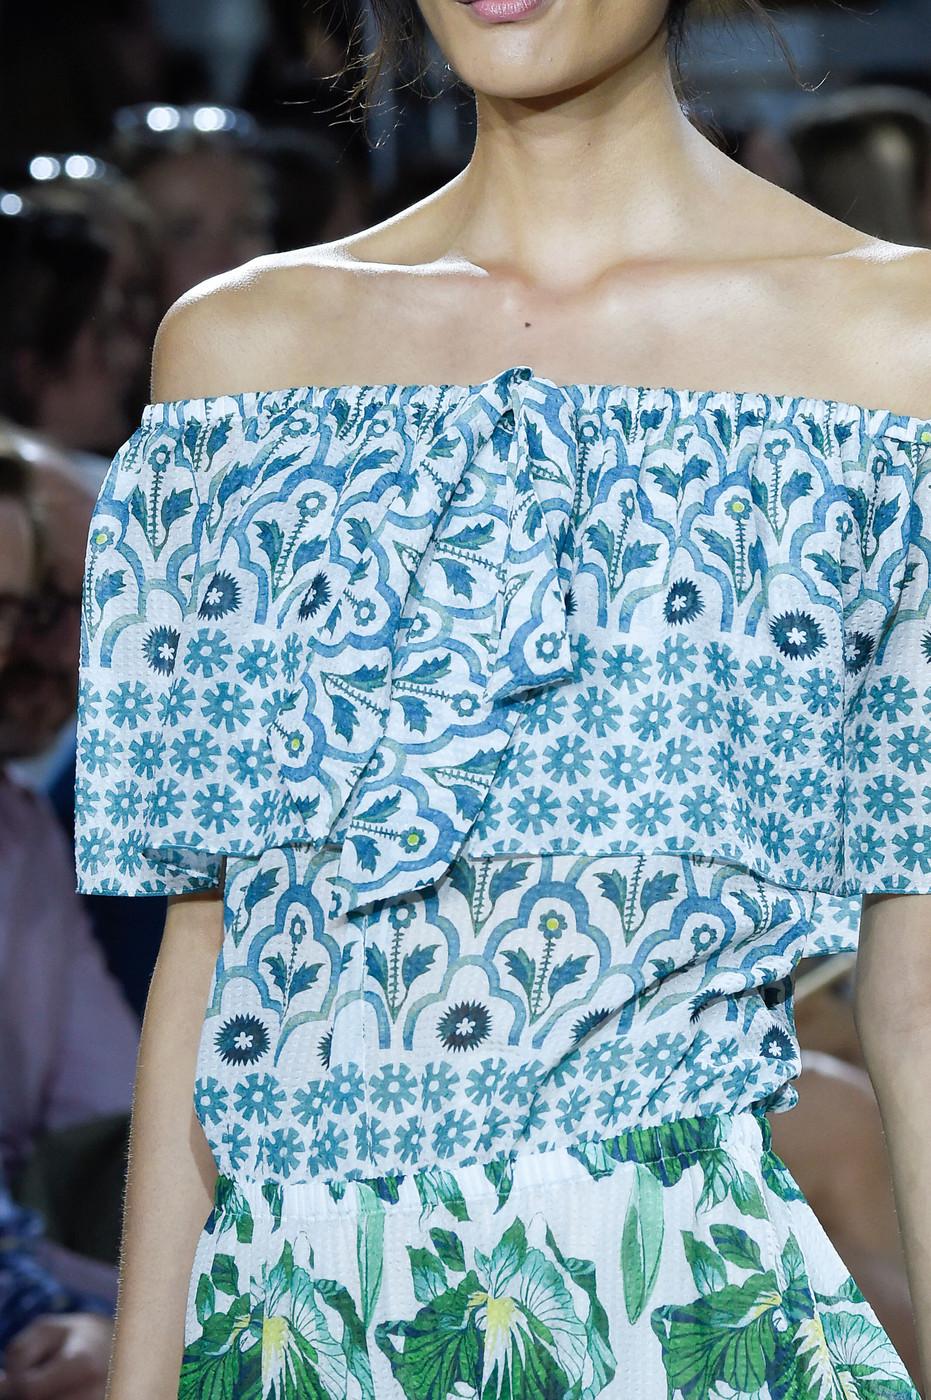 Temperley London Spring/Summer 2016 / London fashion week via www.fashionedbylove.co.uk